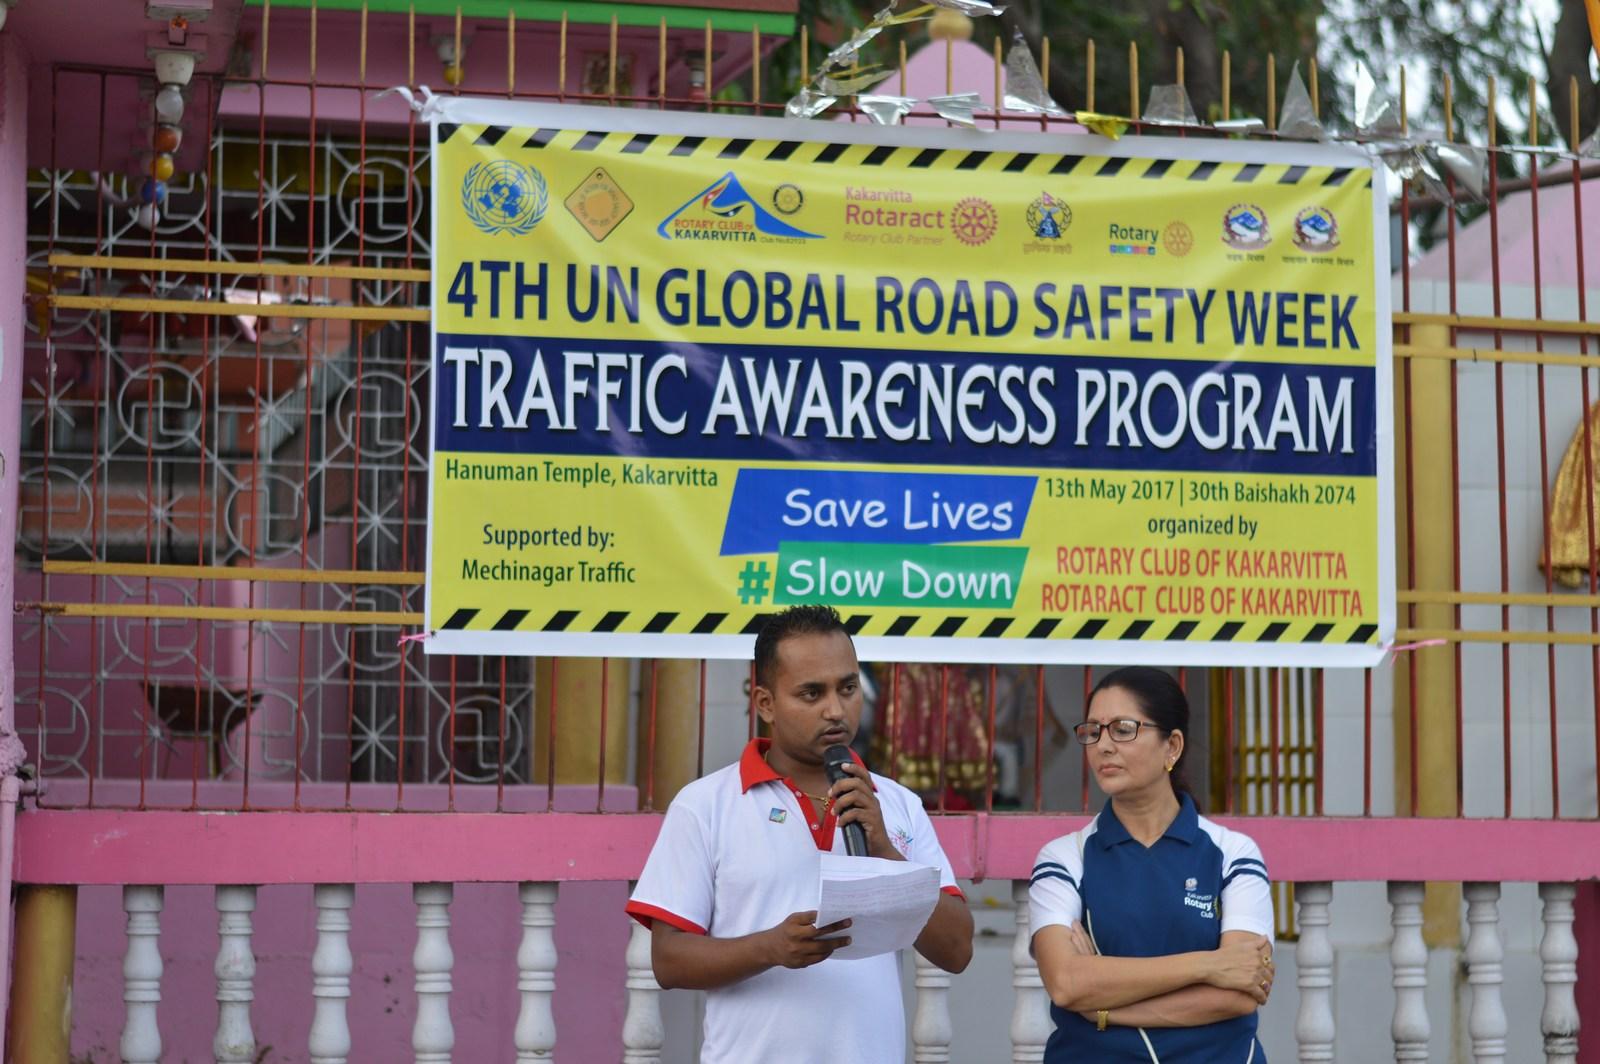 4th-UN-Global-Road-Safety-Week-2017-Traffic-Awareness-Program-Rotary-club-of-Kakarvitta-27